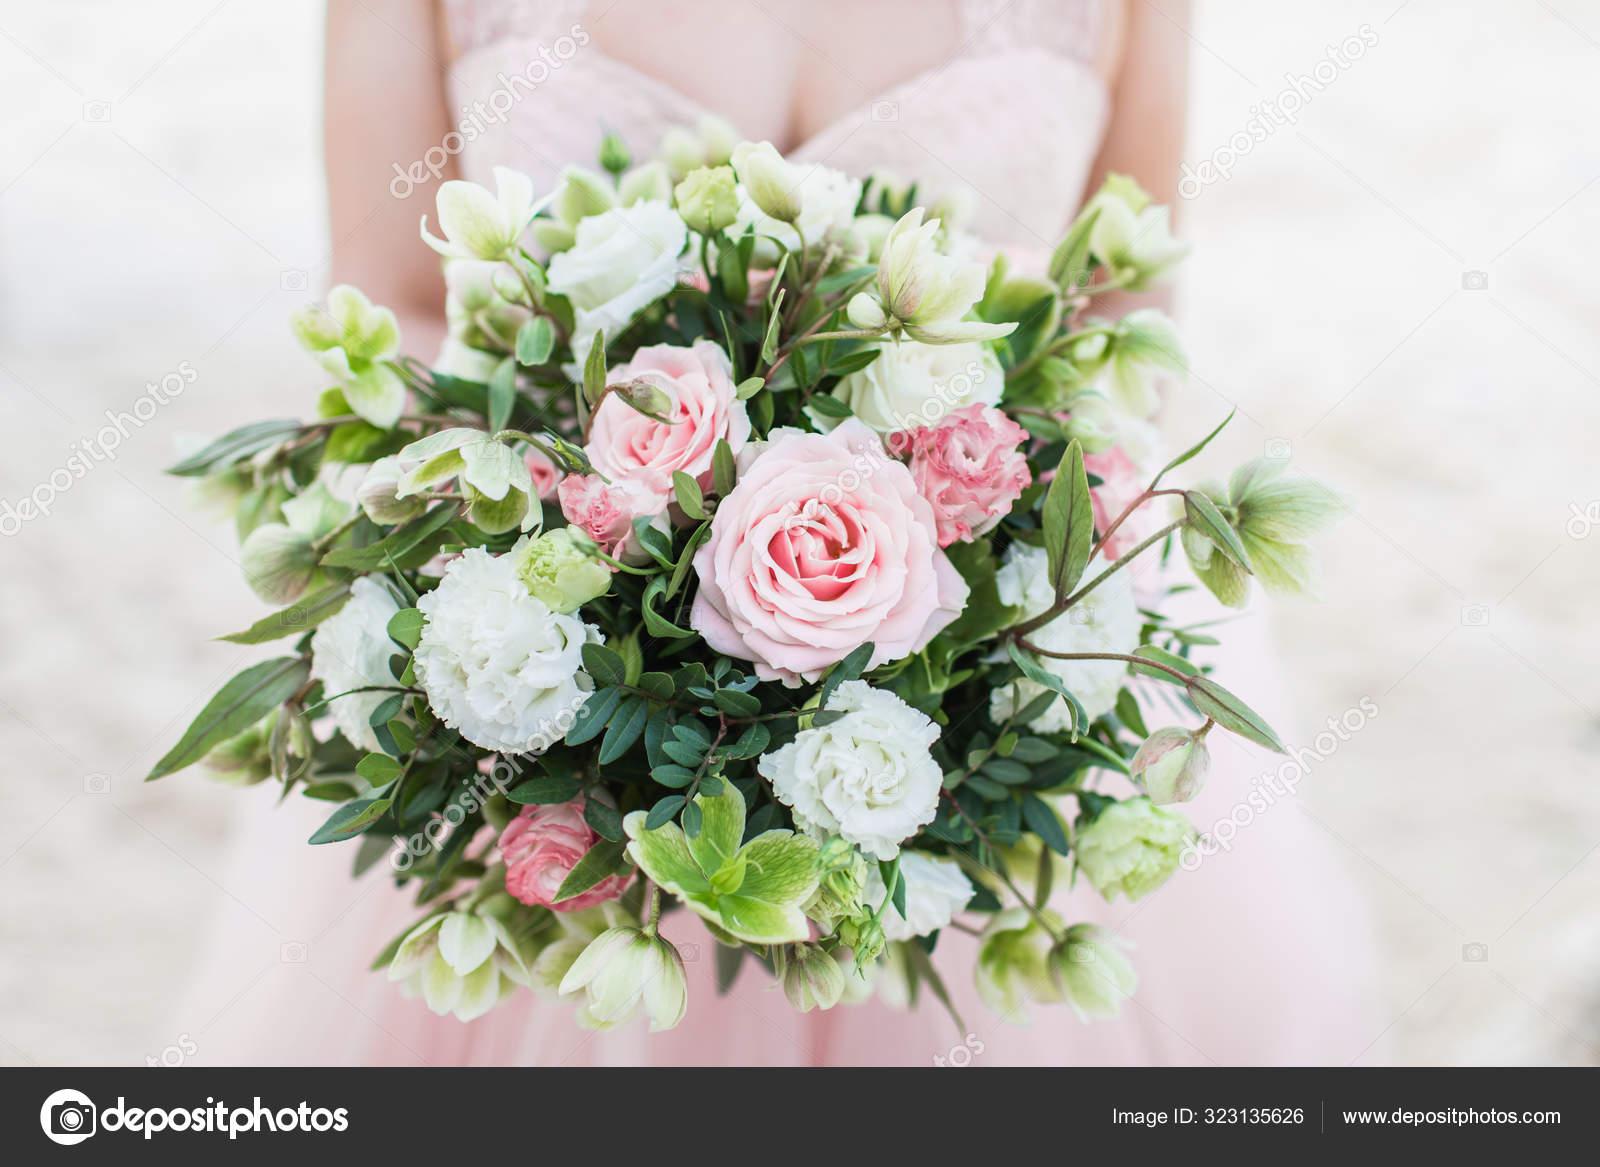 Beautiful Wedding Bouquet In Woman Hands Pink Rose Tulips Car Stock Photo C Olegbreslavtsev 323135626